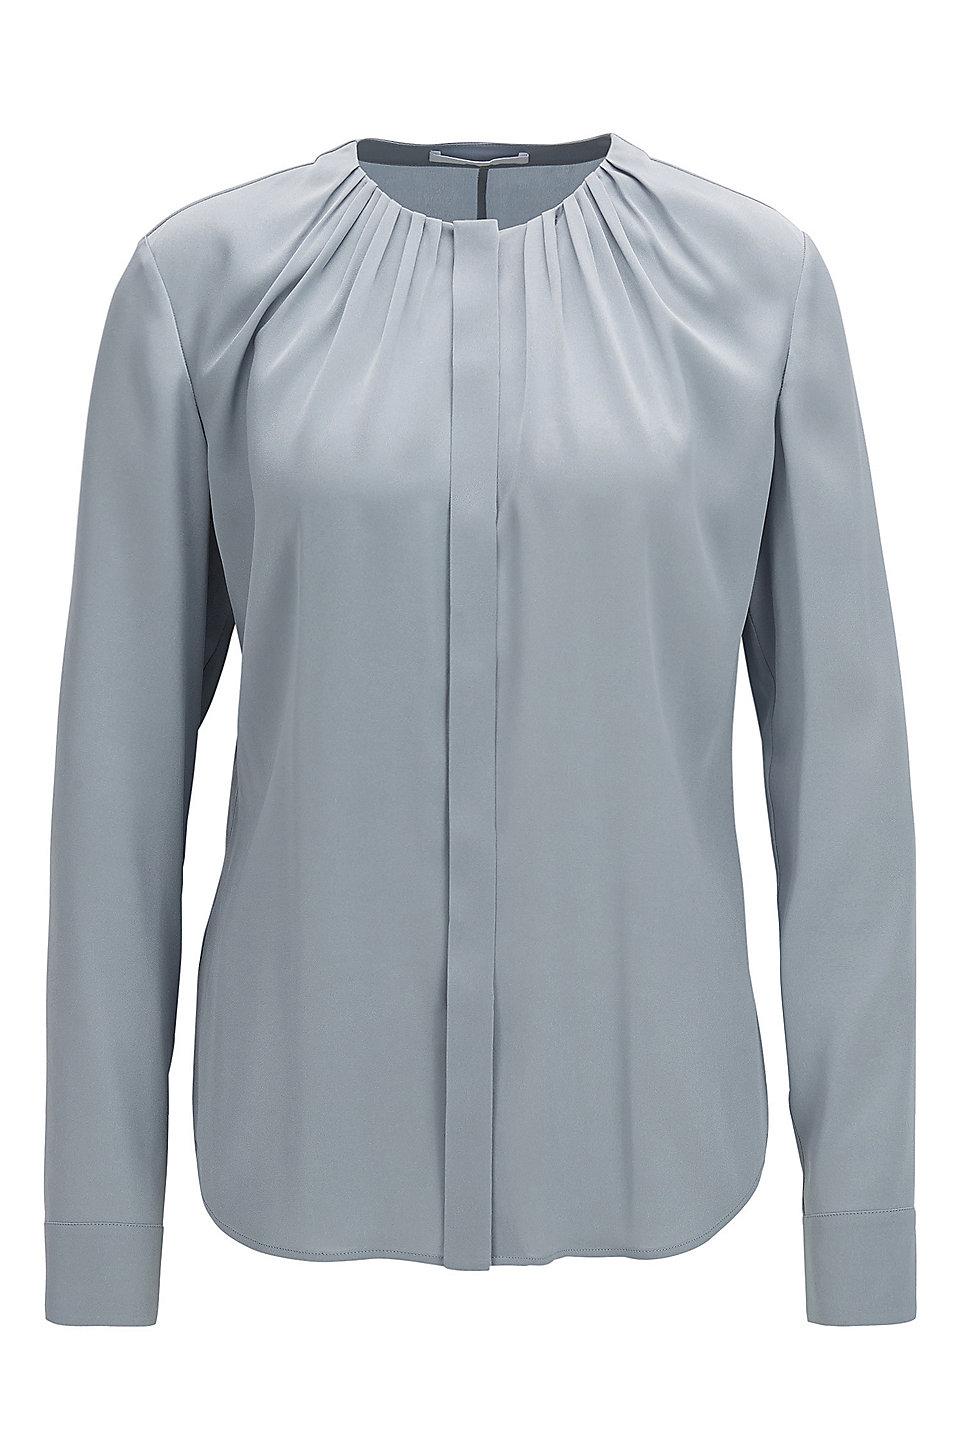 5139f25d9c2b7 BOSS - Silk-blend blouse with gathered neckline